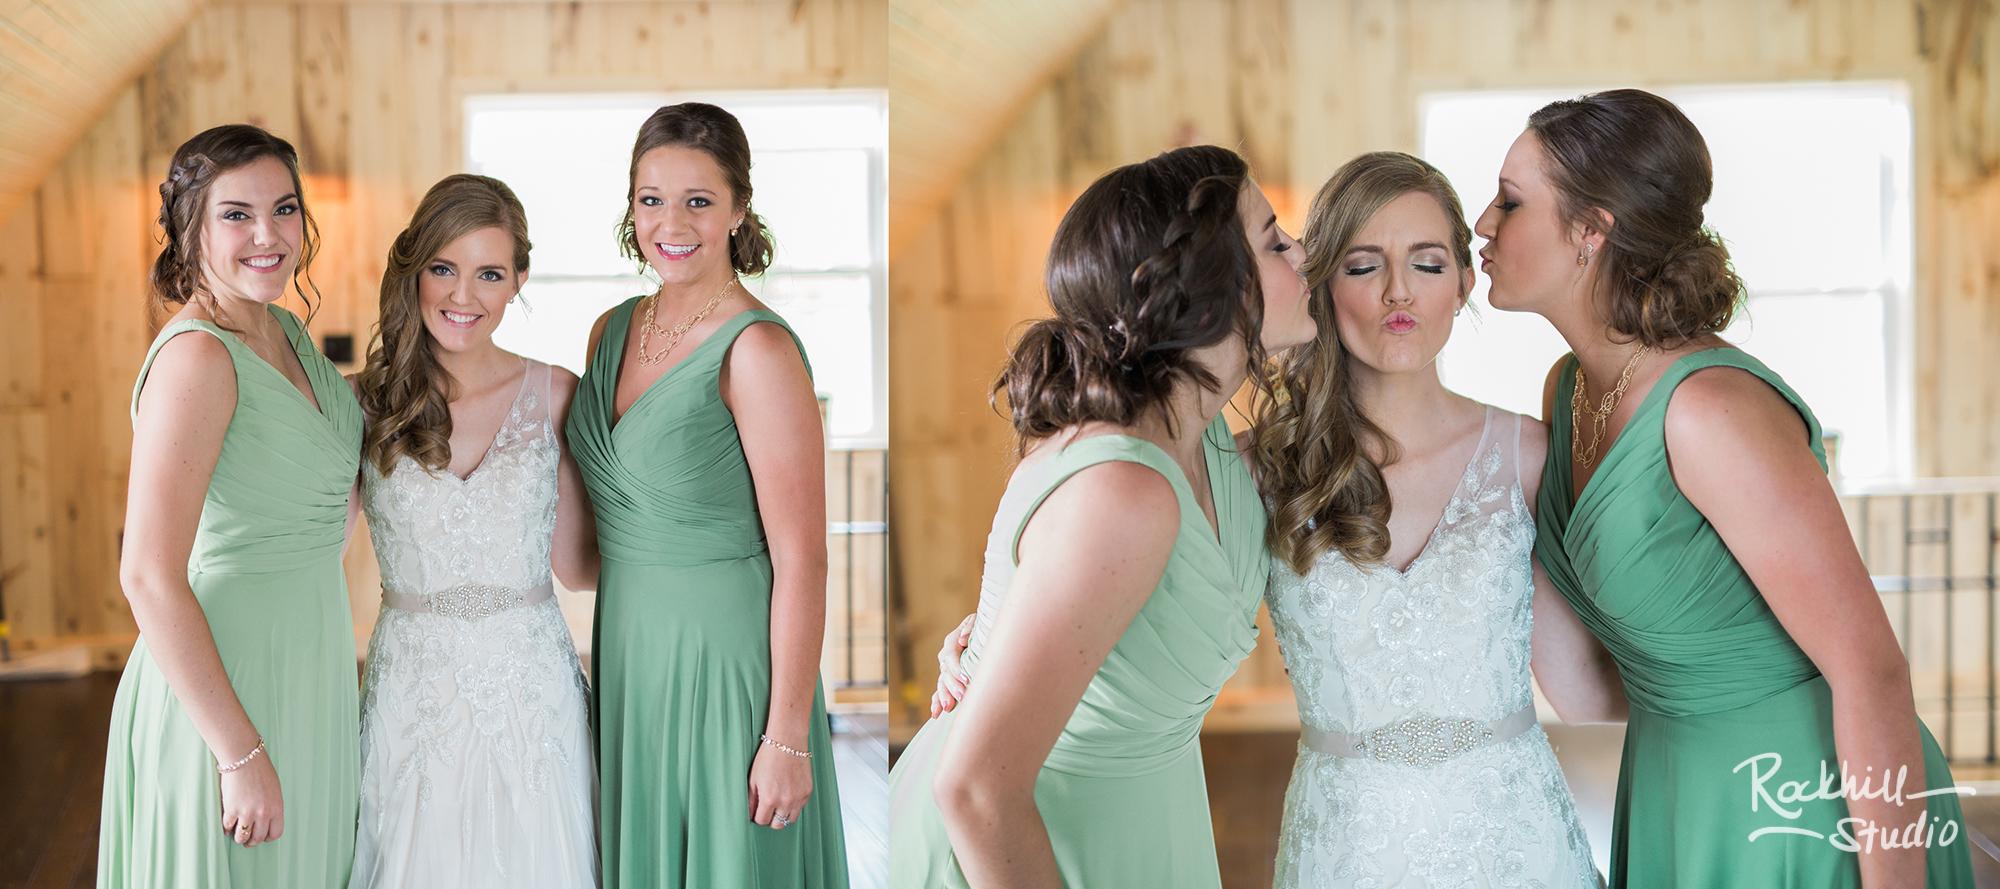 newberry-michigan-wedding-upper-peninsula-spring-photography-rockhill-ee-8.jpg